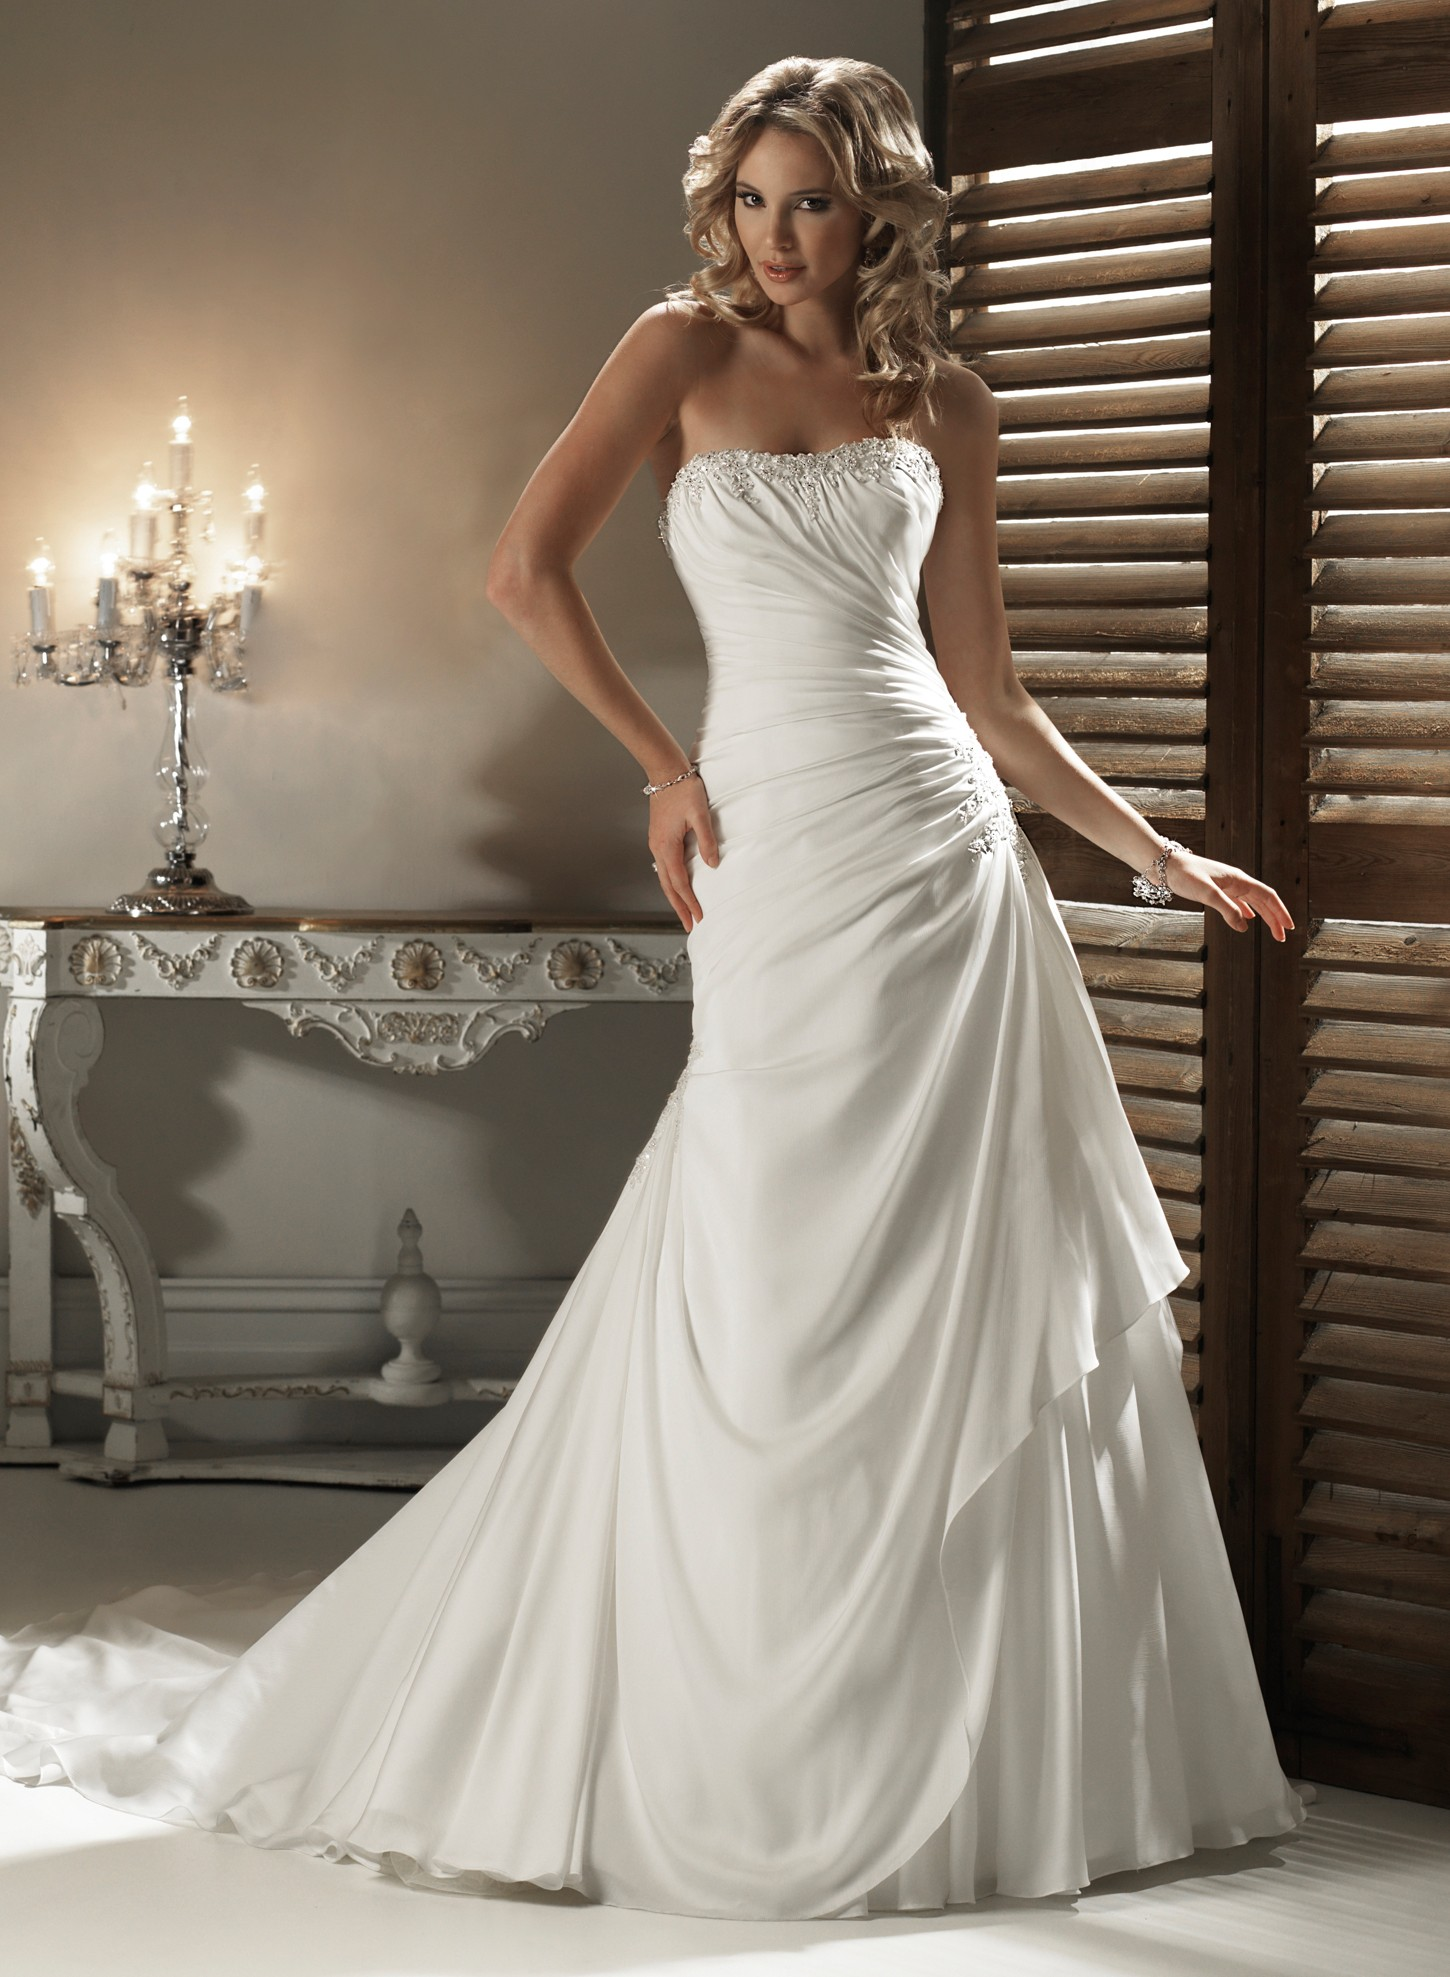 chiffon bridesmaid dresses for beach wedding photo - 1